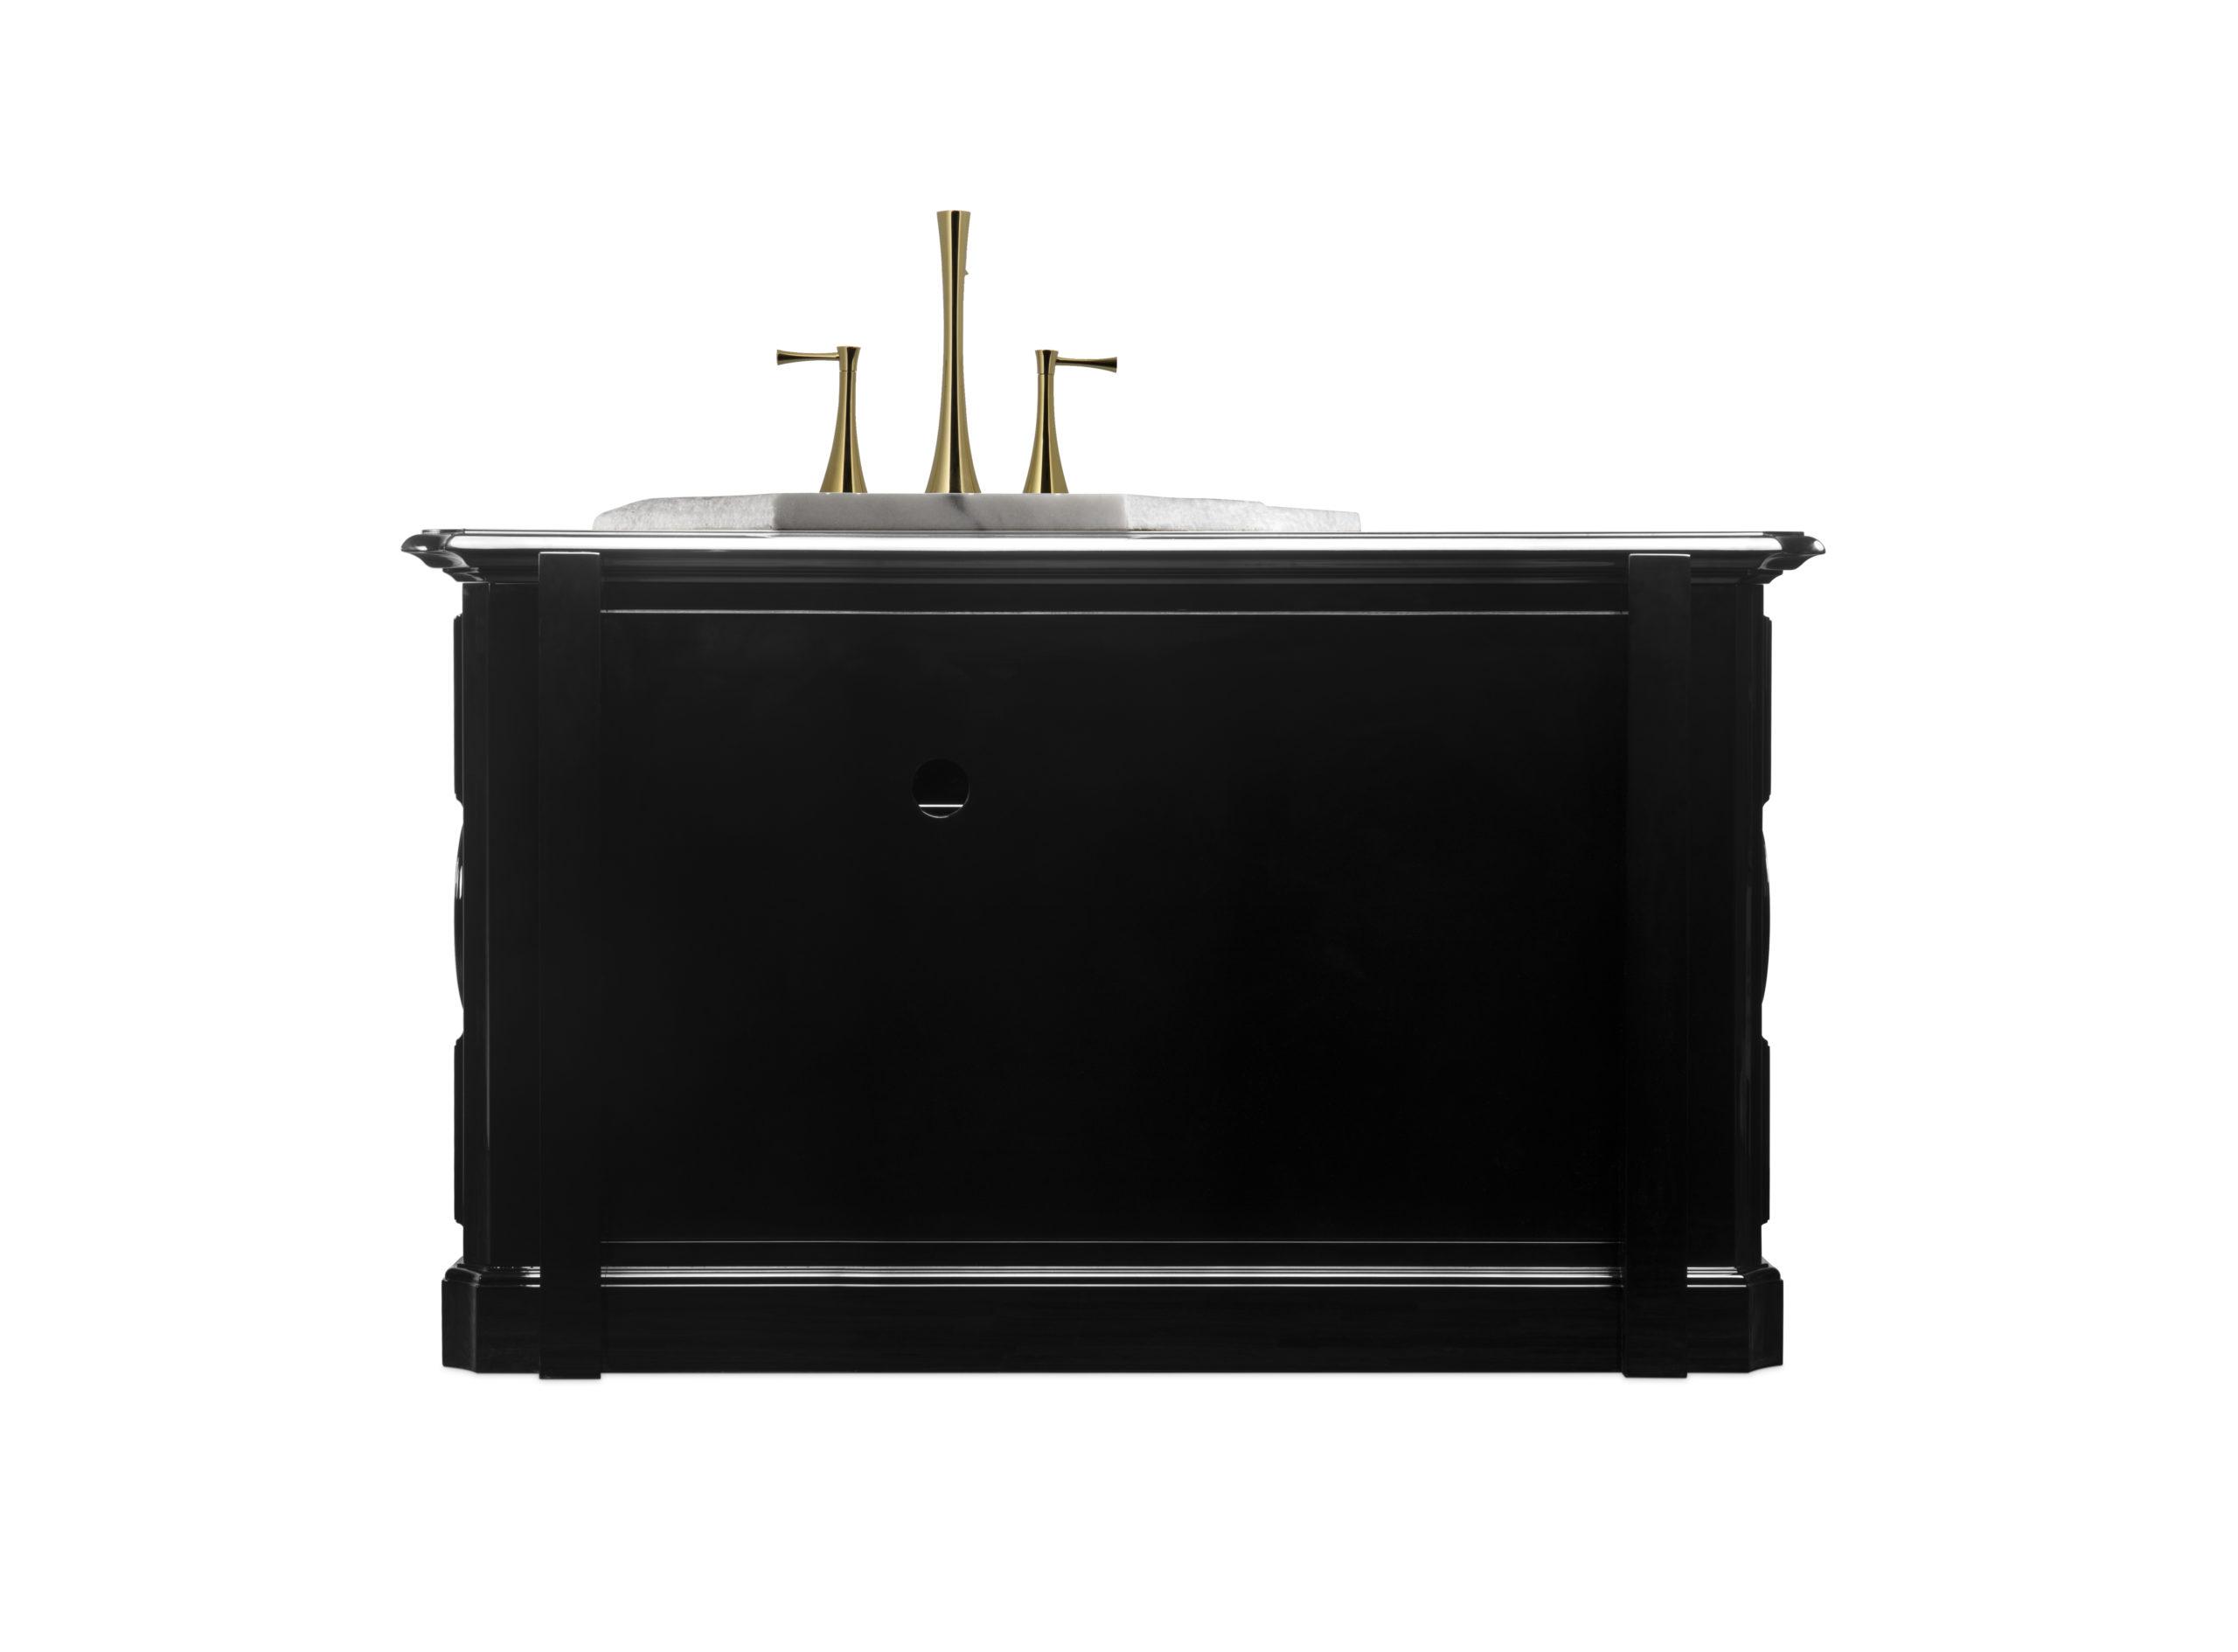 Washbasin, £6,000, Maison Valentina